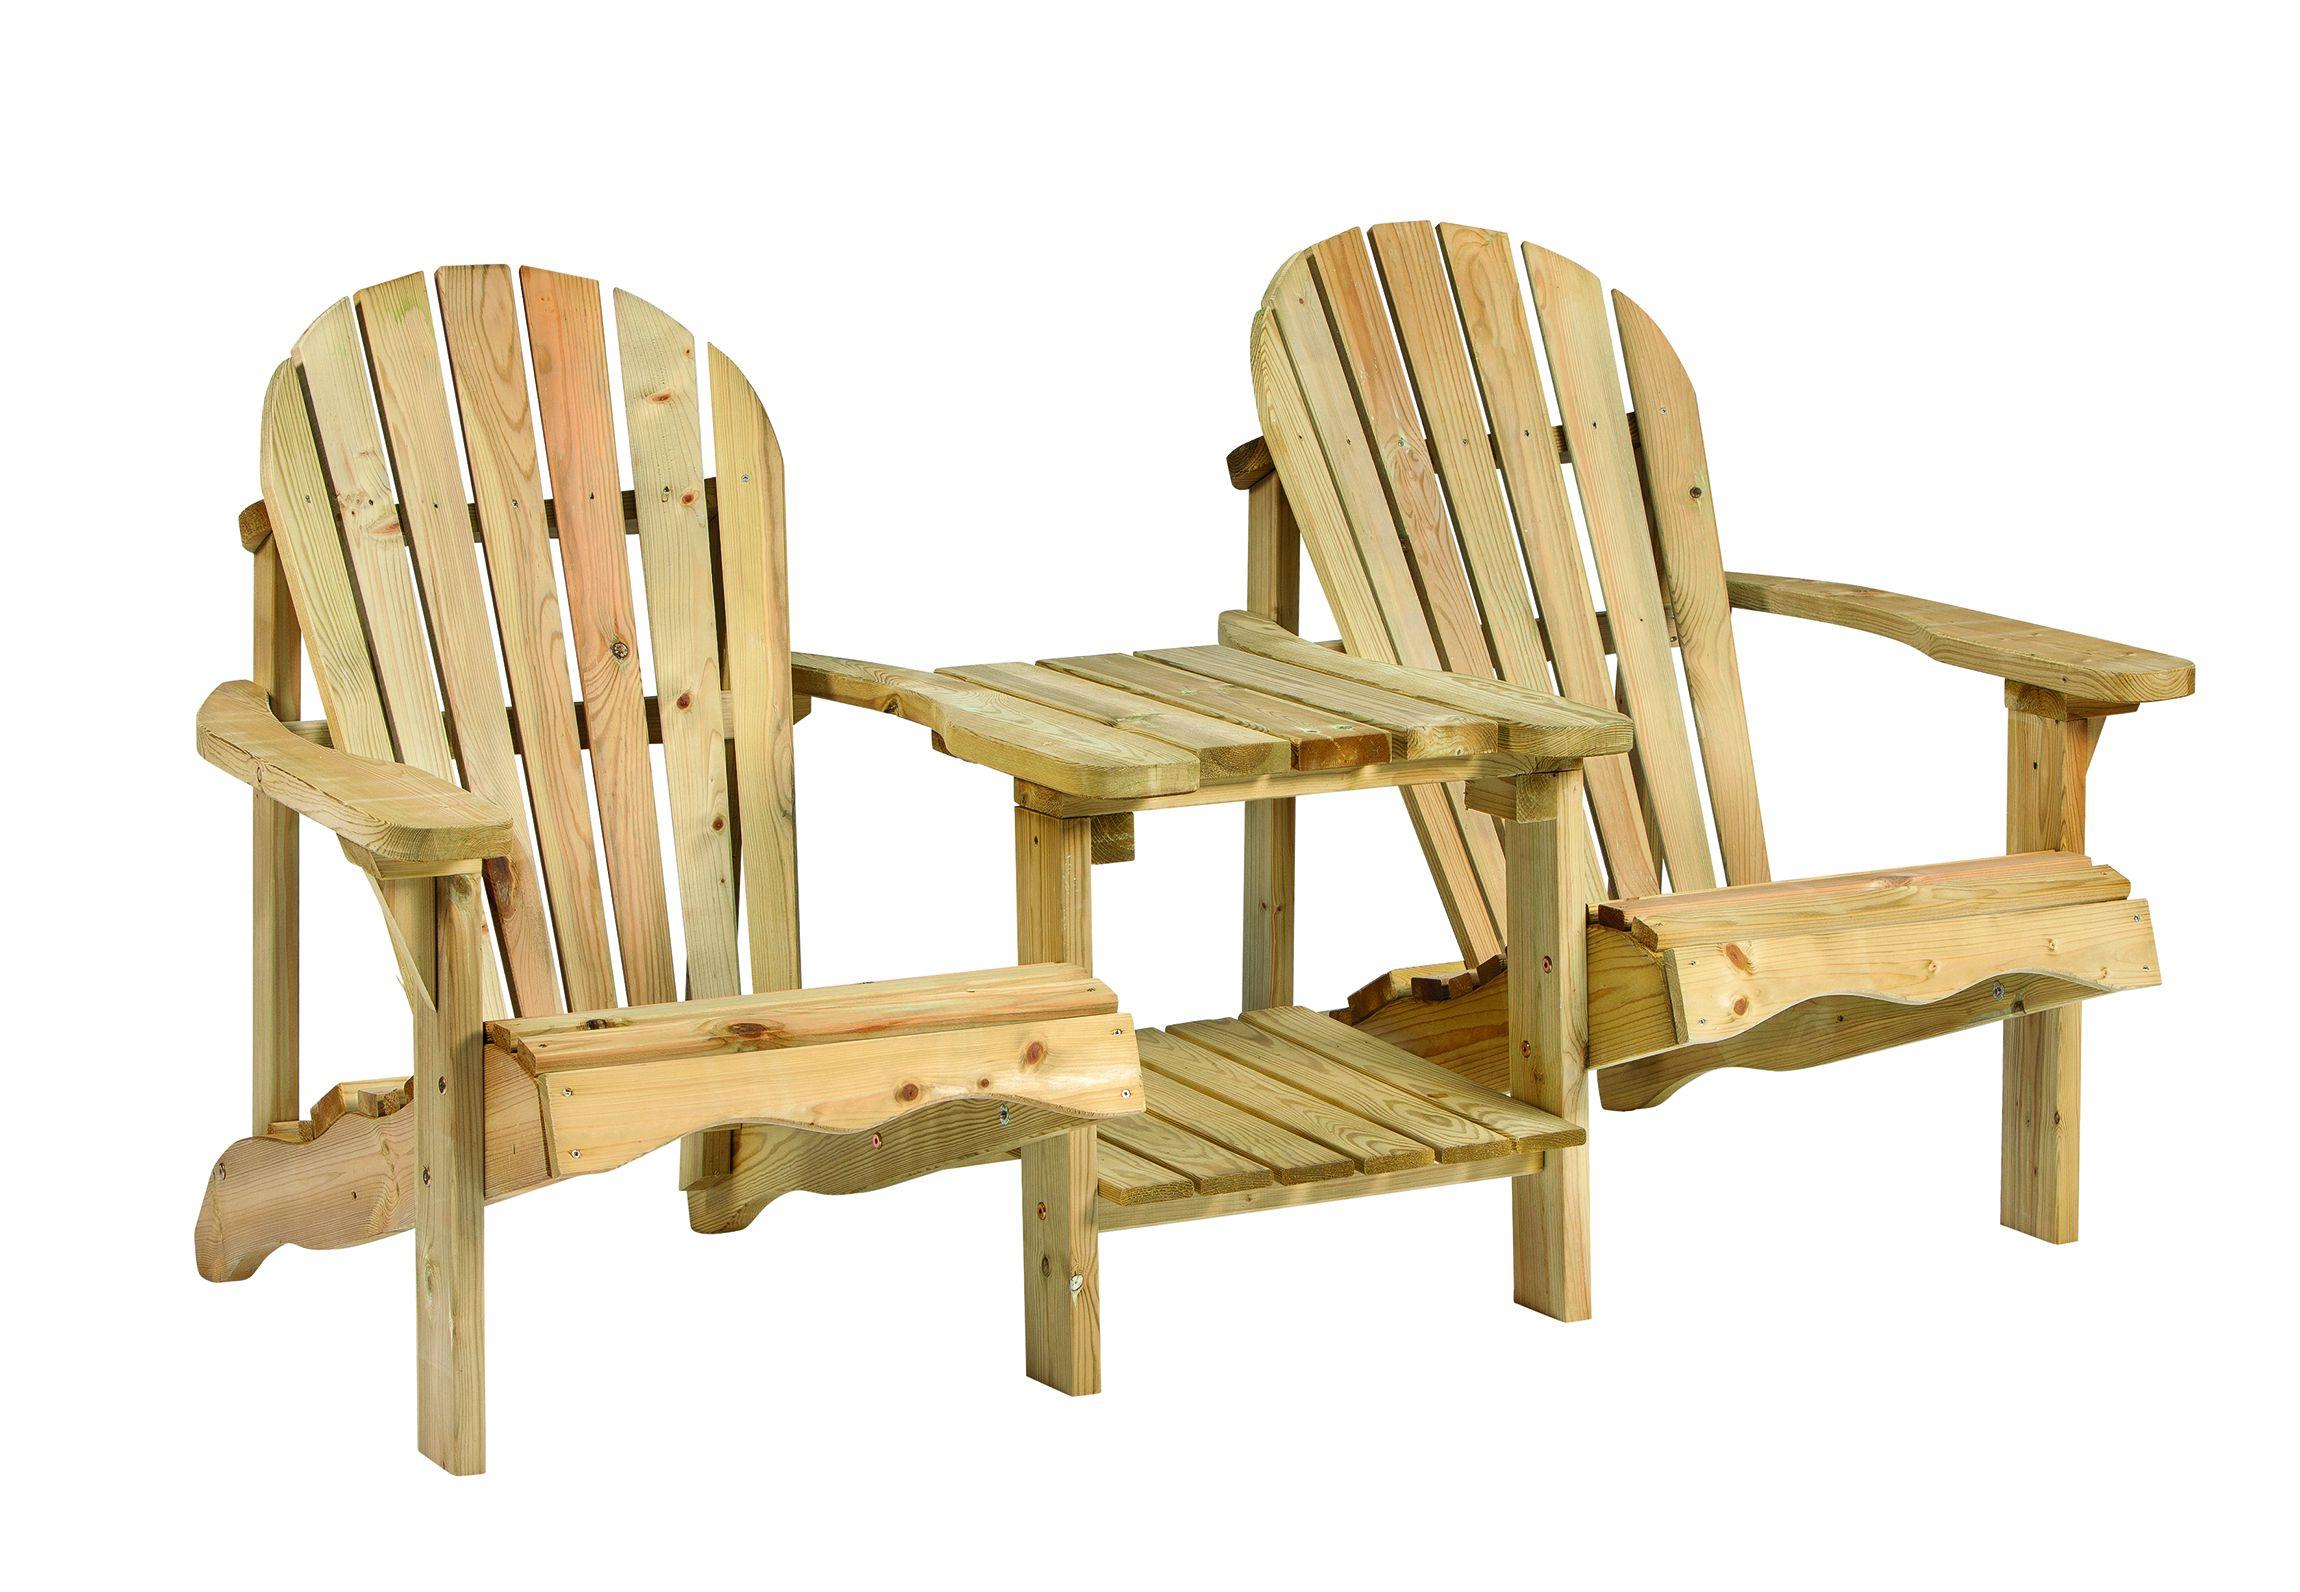 Houten Balkon Meubels : Balkonmeubelen hout balkon meubels kopen